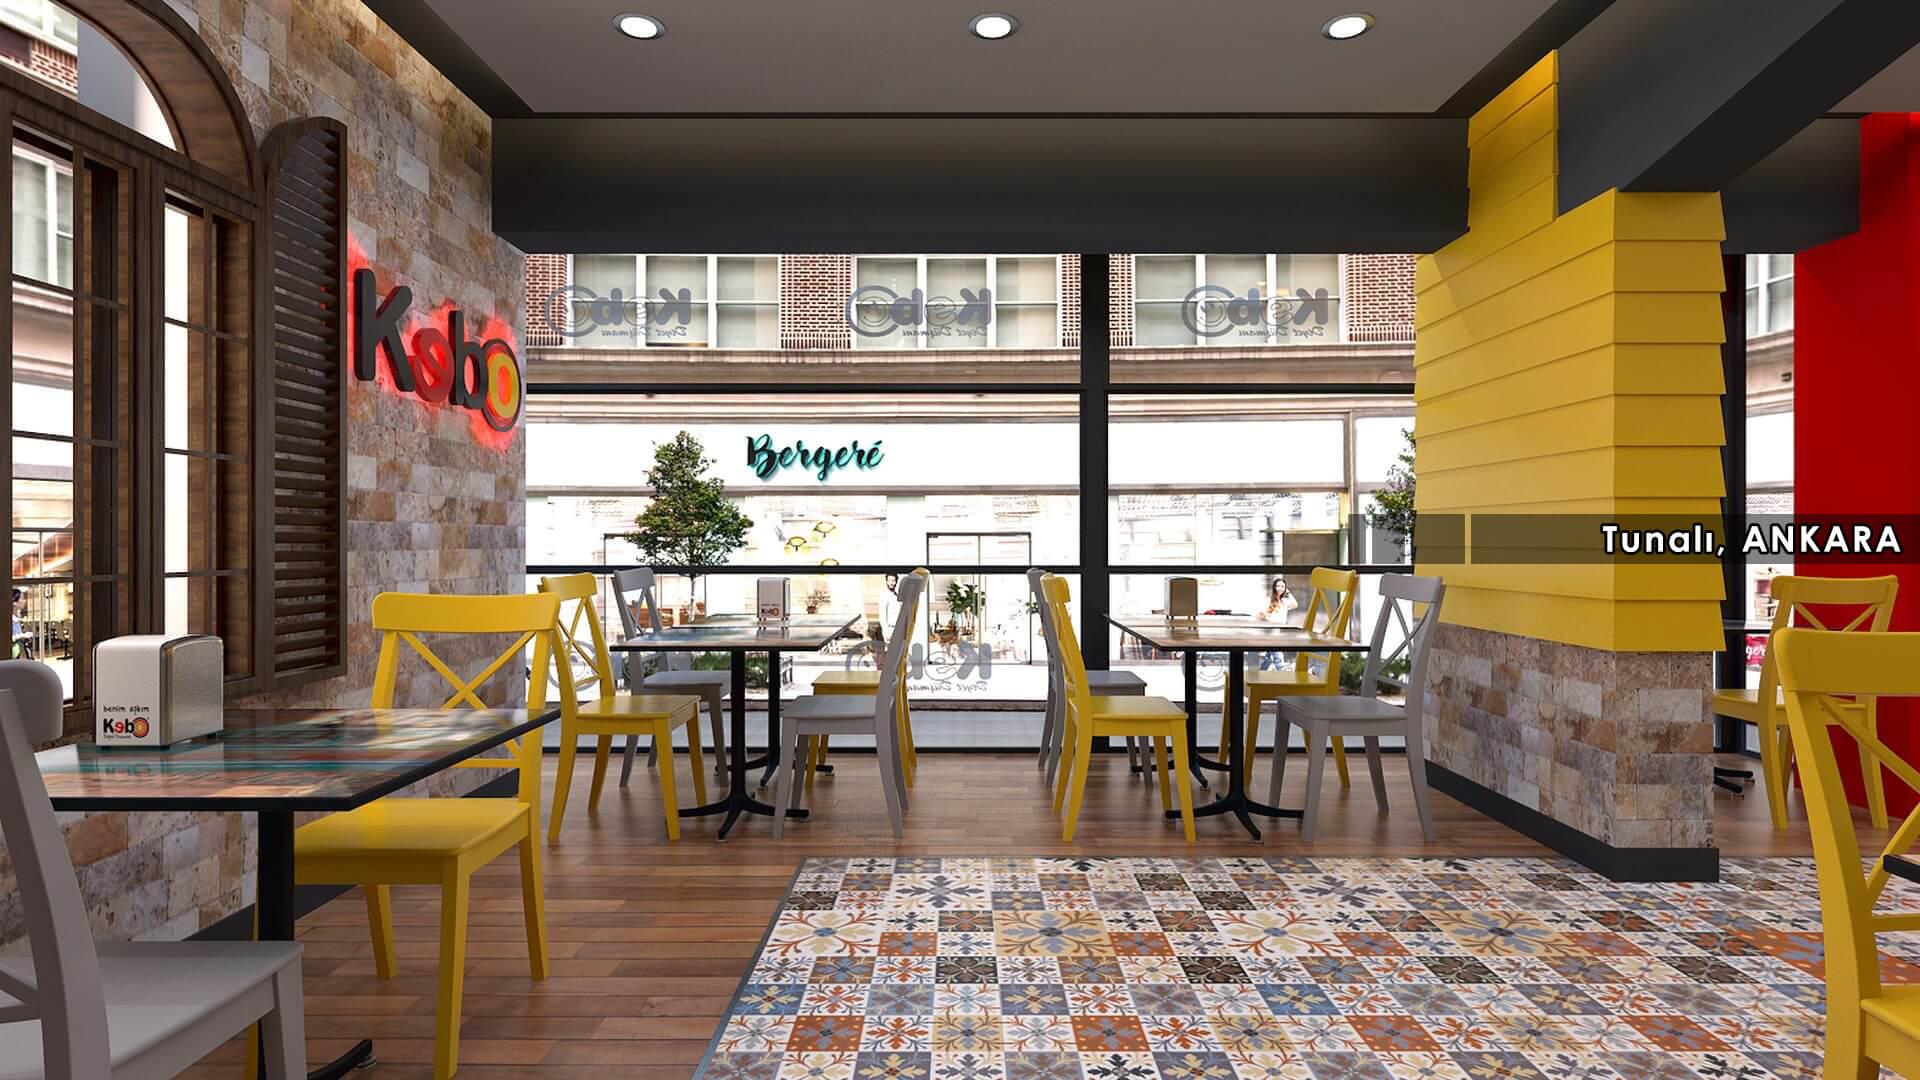 Restaurant interior design Kebo 2016